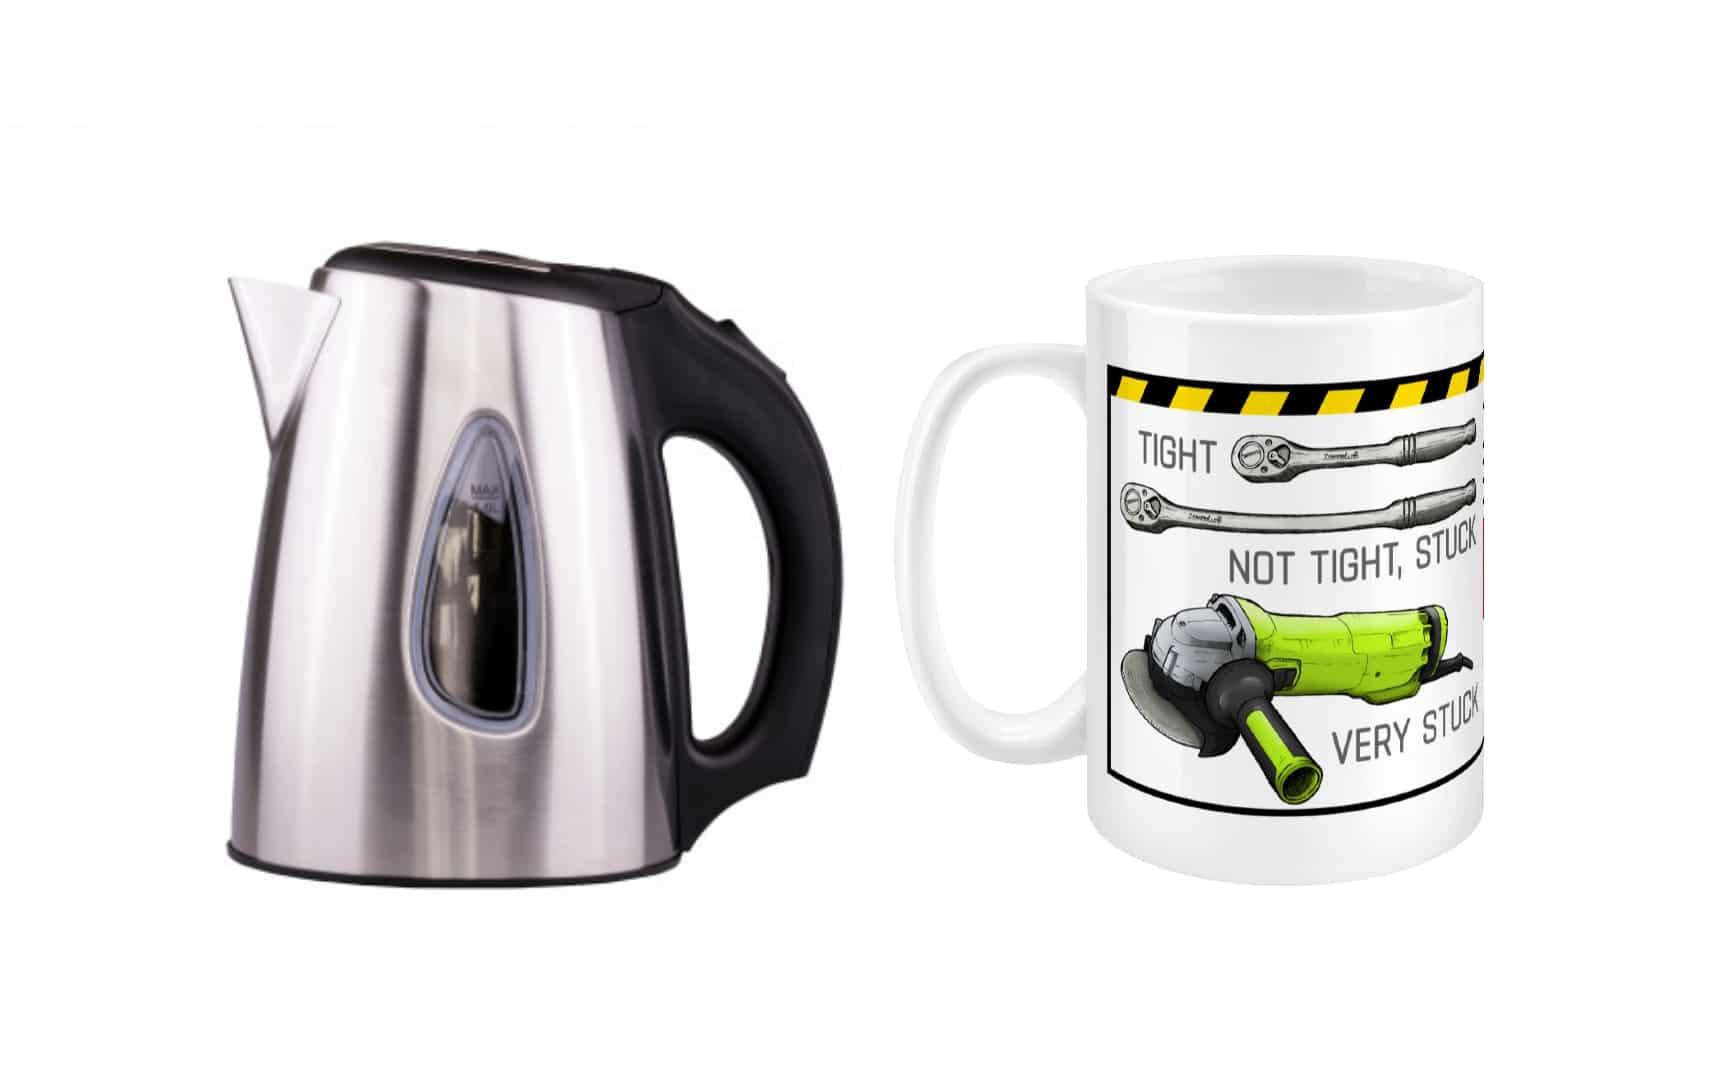 mug, kettle, shop, not 2 grand, not2grand, n2g, n2g shop, coffee, tea, working on cars, fixing cars, diy, tools, not2grand.co.uk